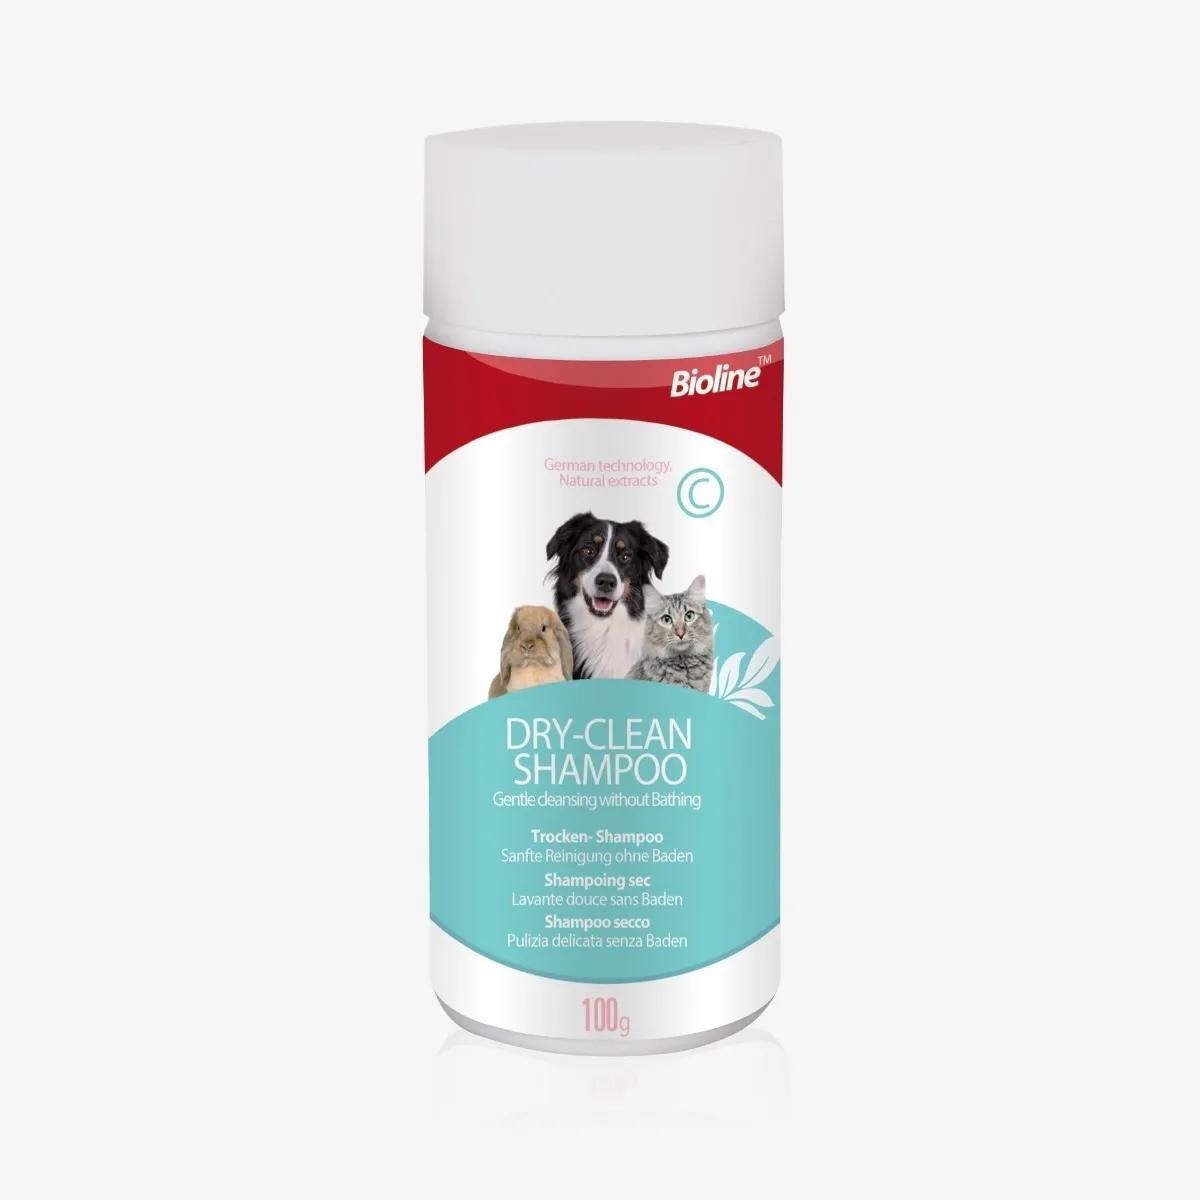 Bioline Shampoo Seco Dry-Clean 100g